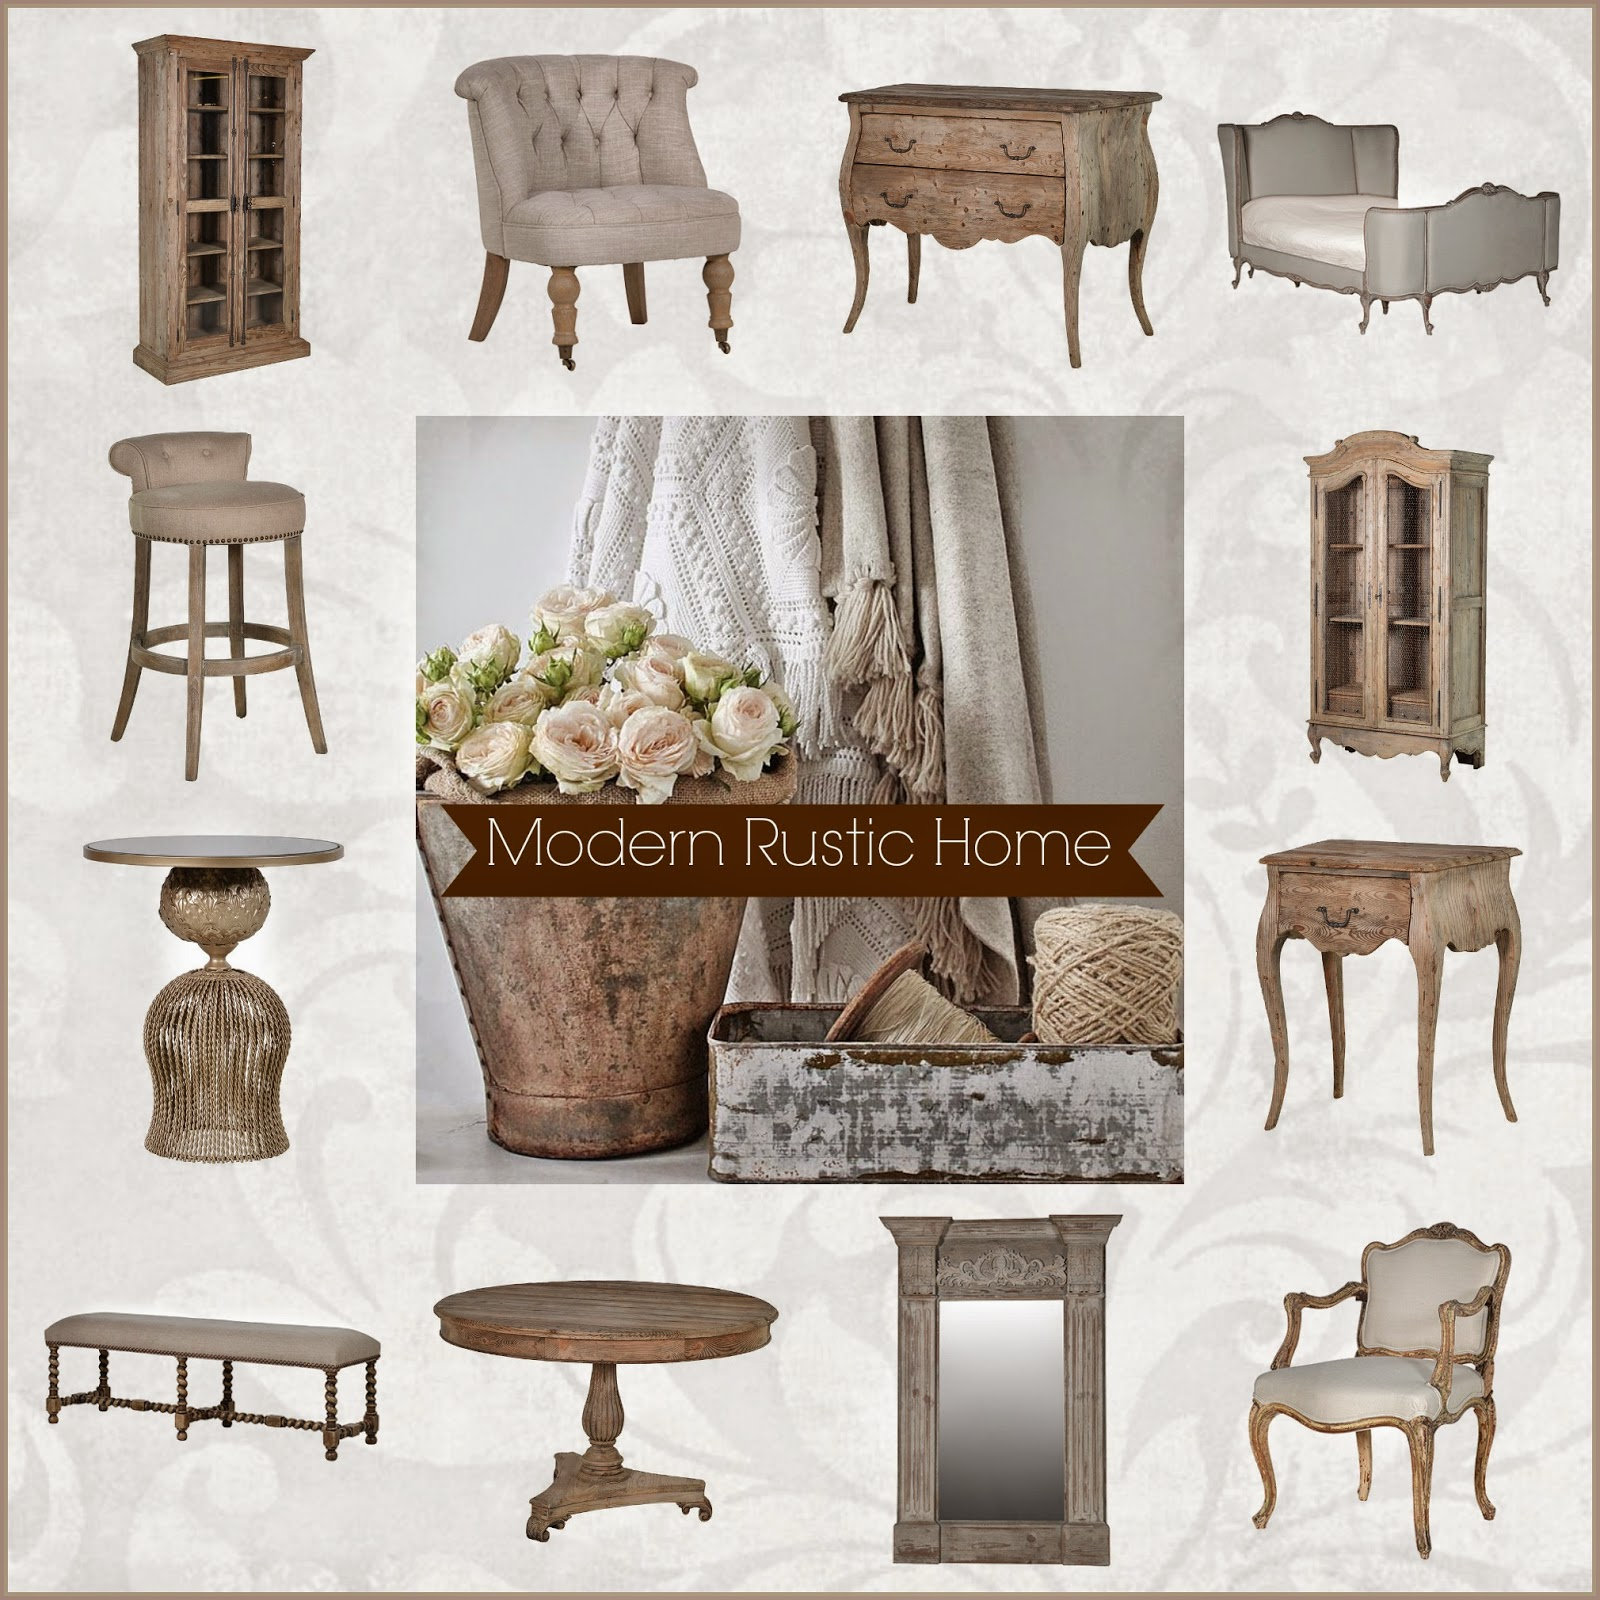 La Maison Chic French Furniture Interiors Blog: Modern Rustic